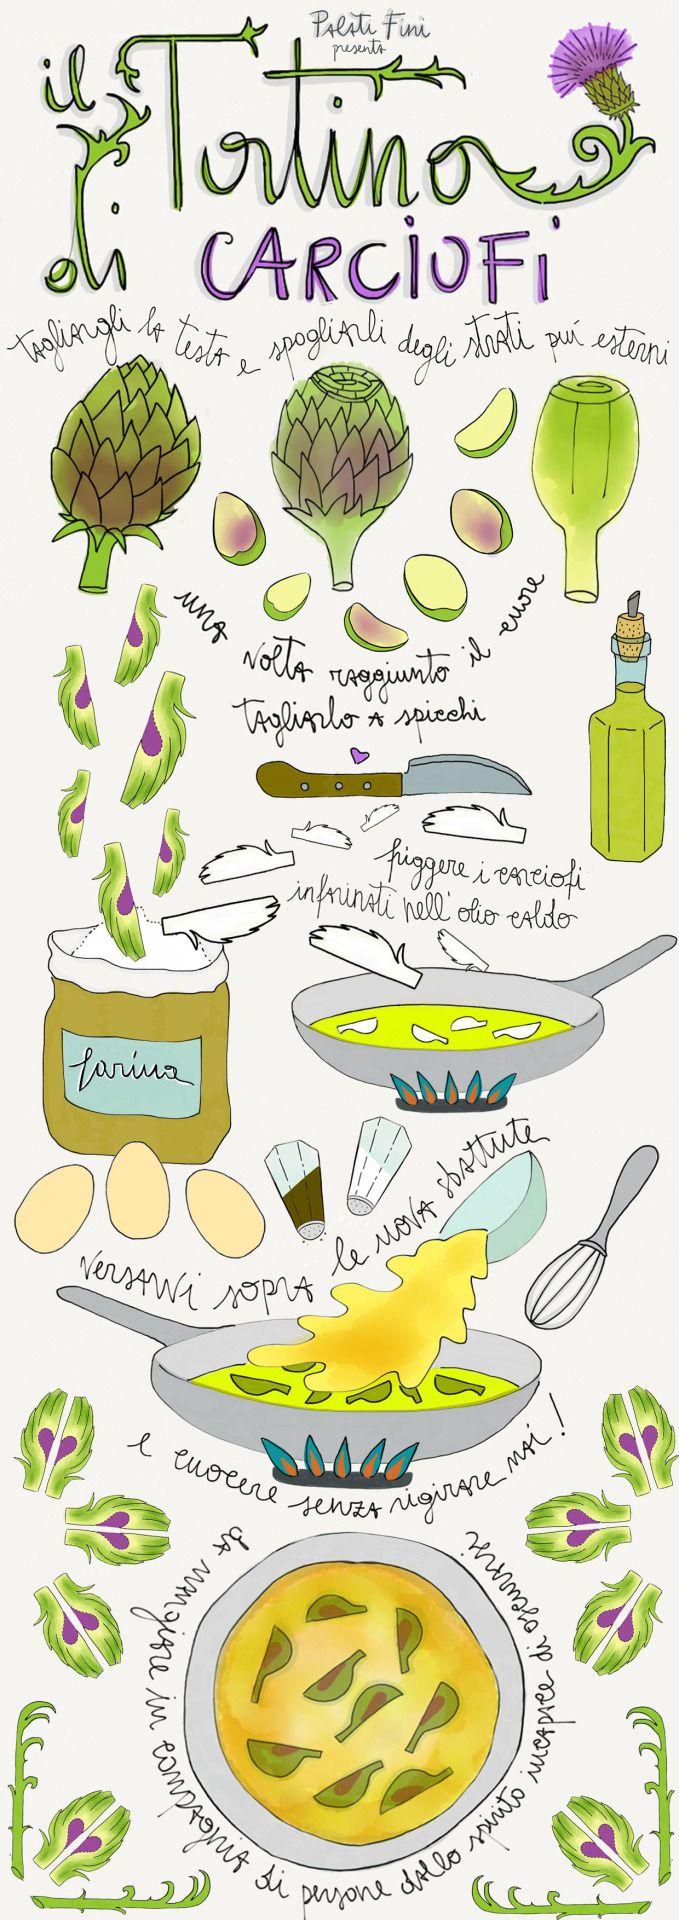 carciofi artichoke illustration omelette food